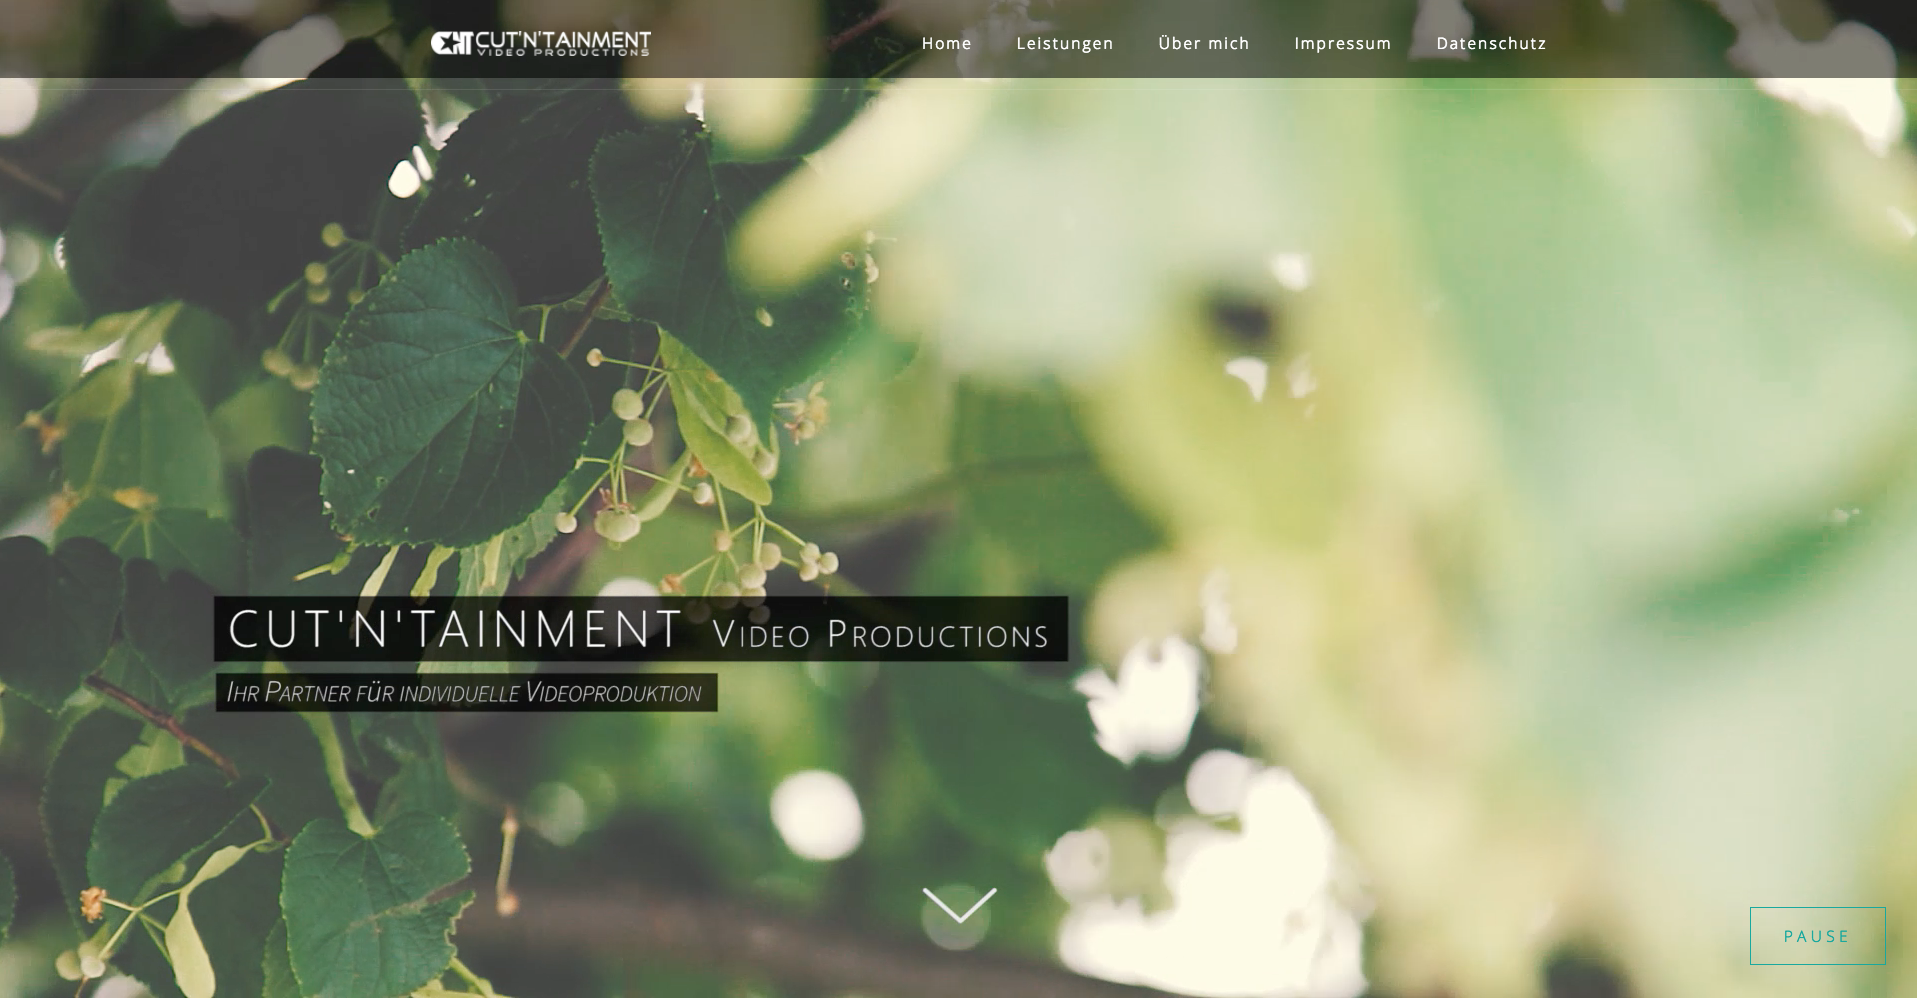 cutntainment video produktionen